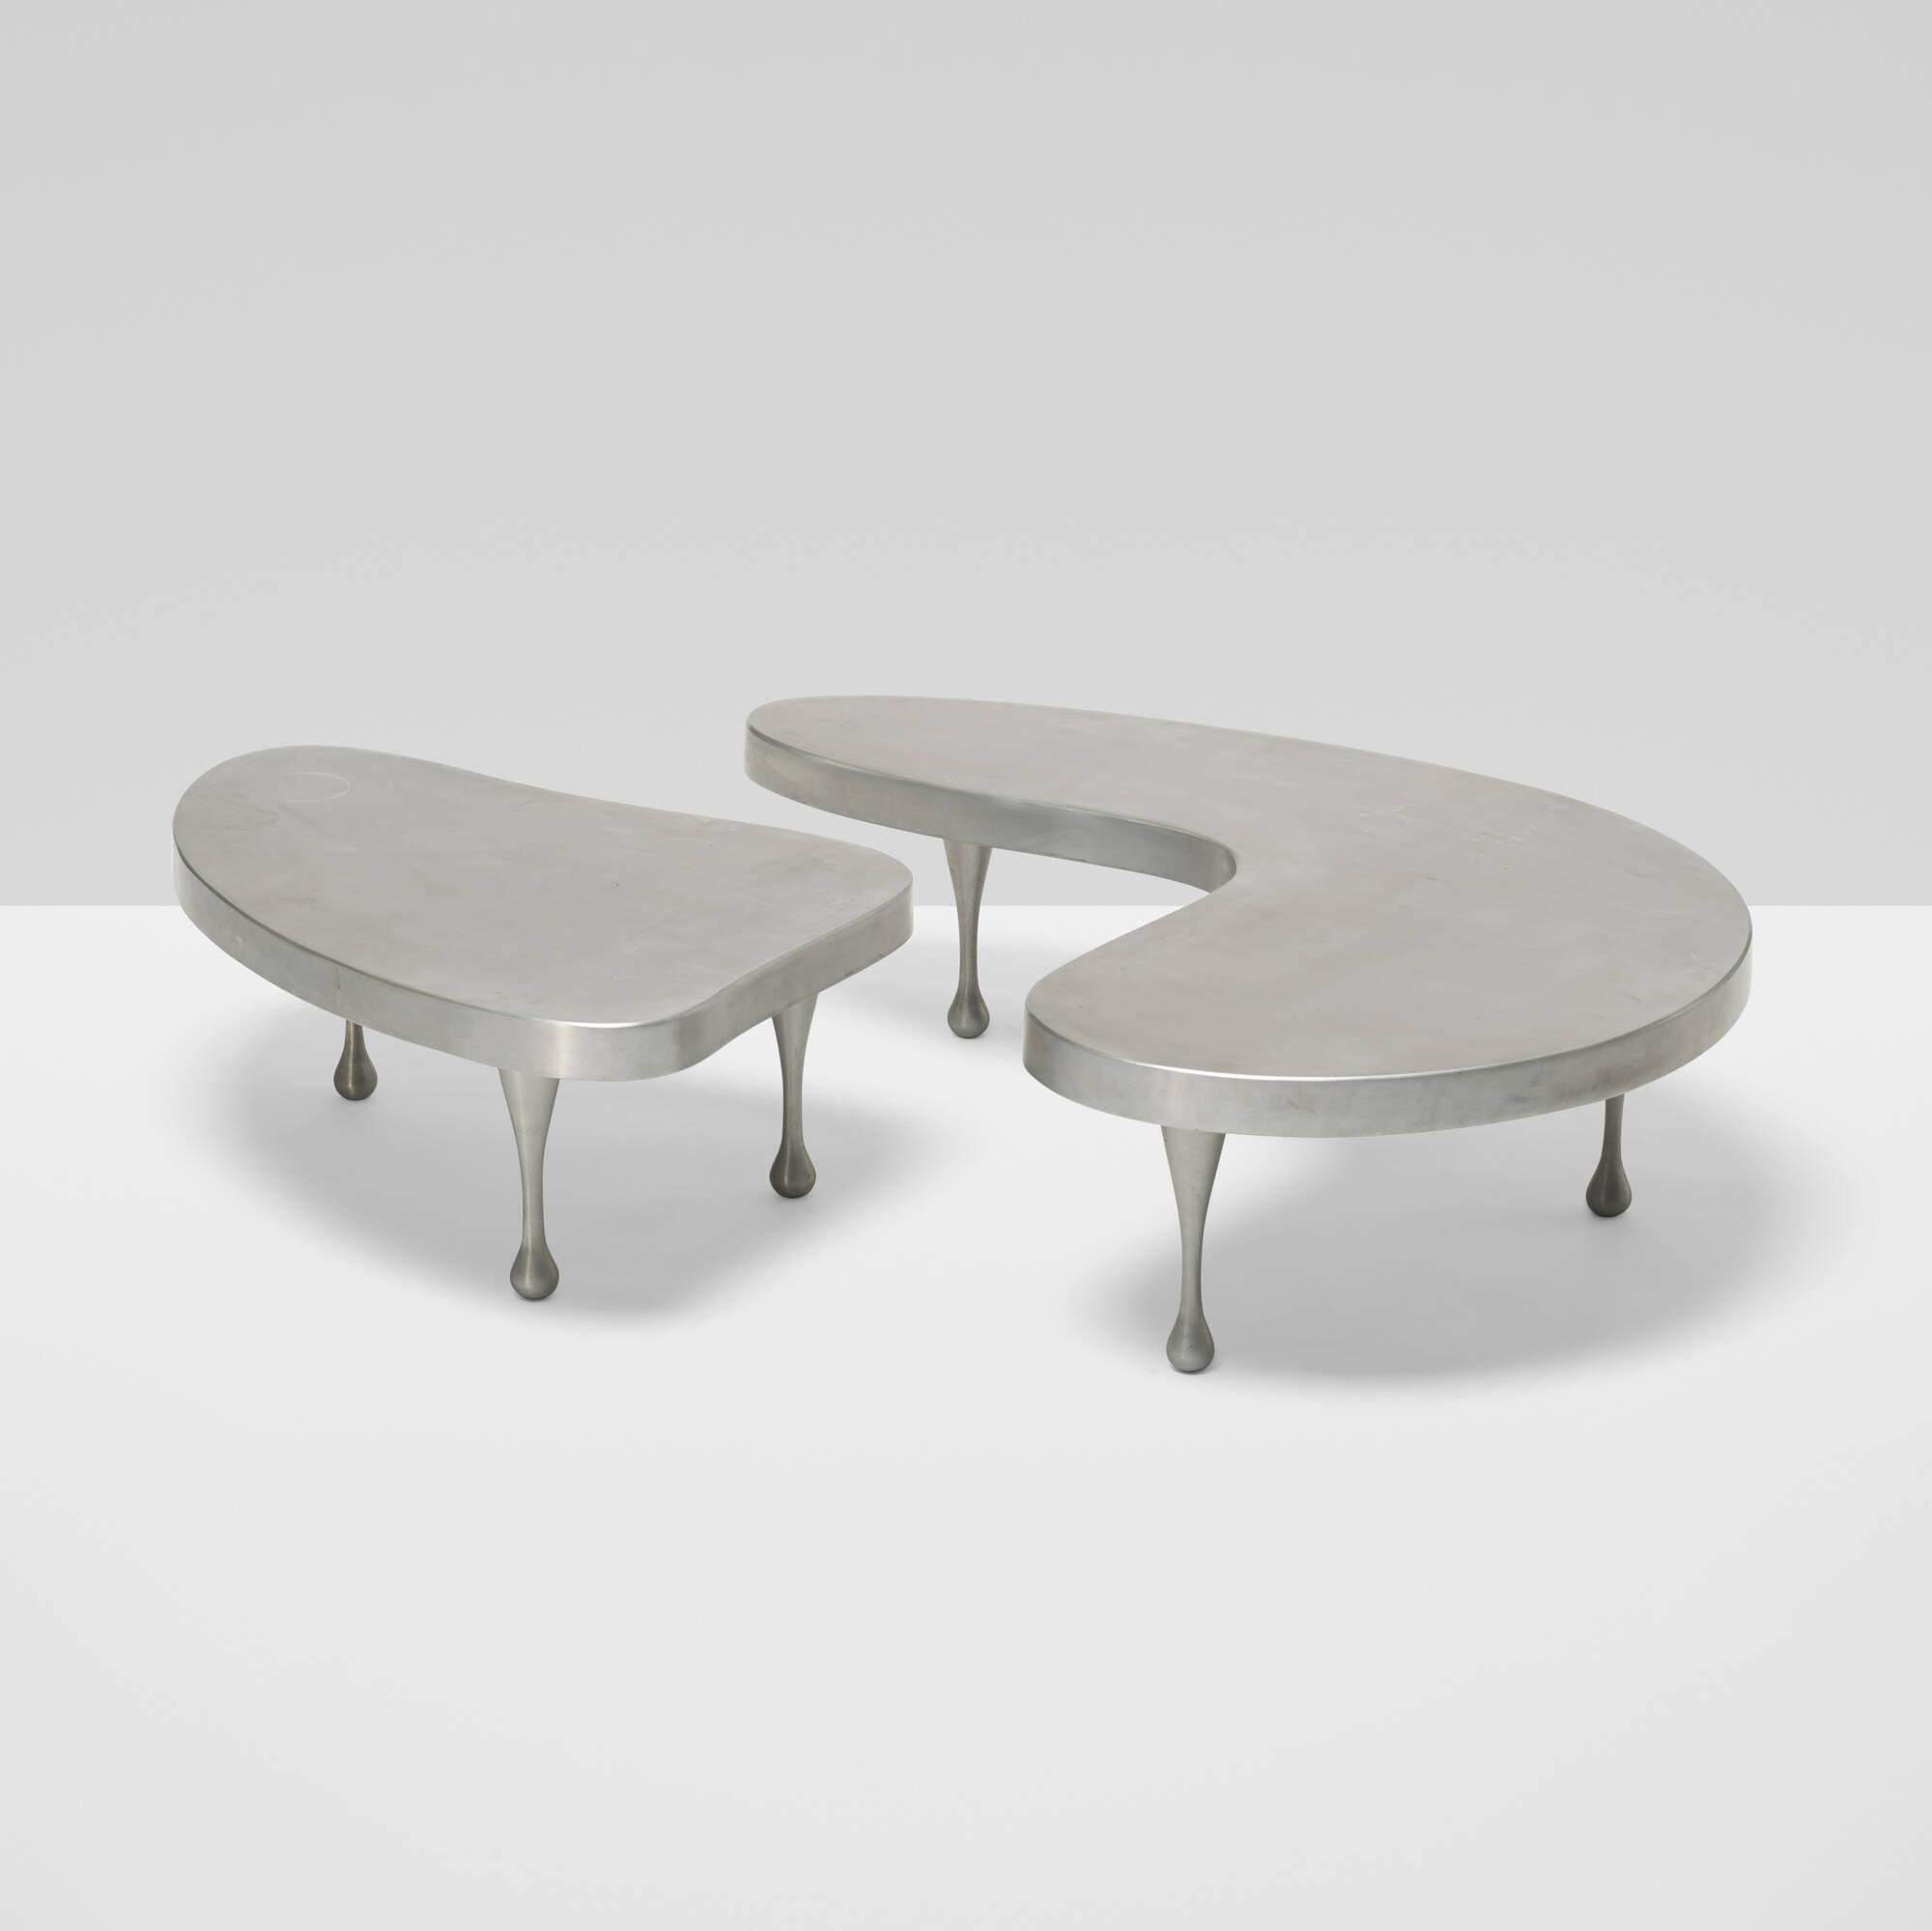 310: Frederick Kiesler / tables (1 of 7)